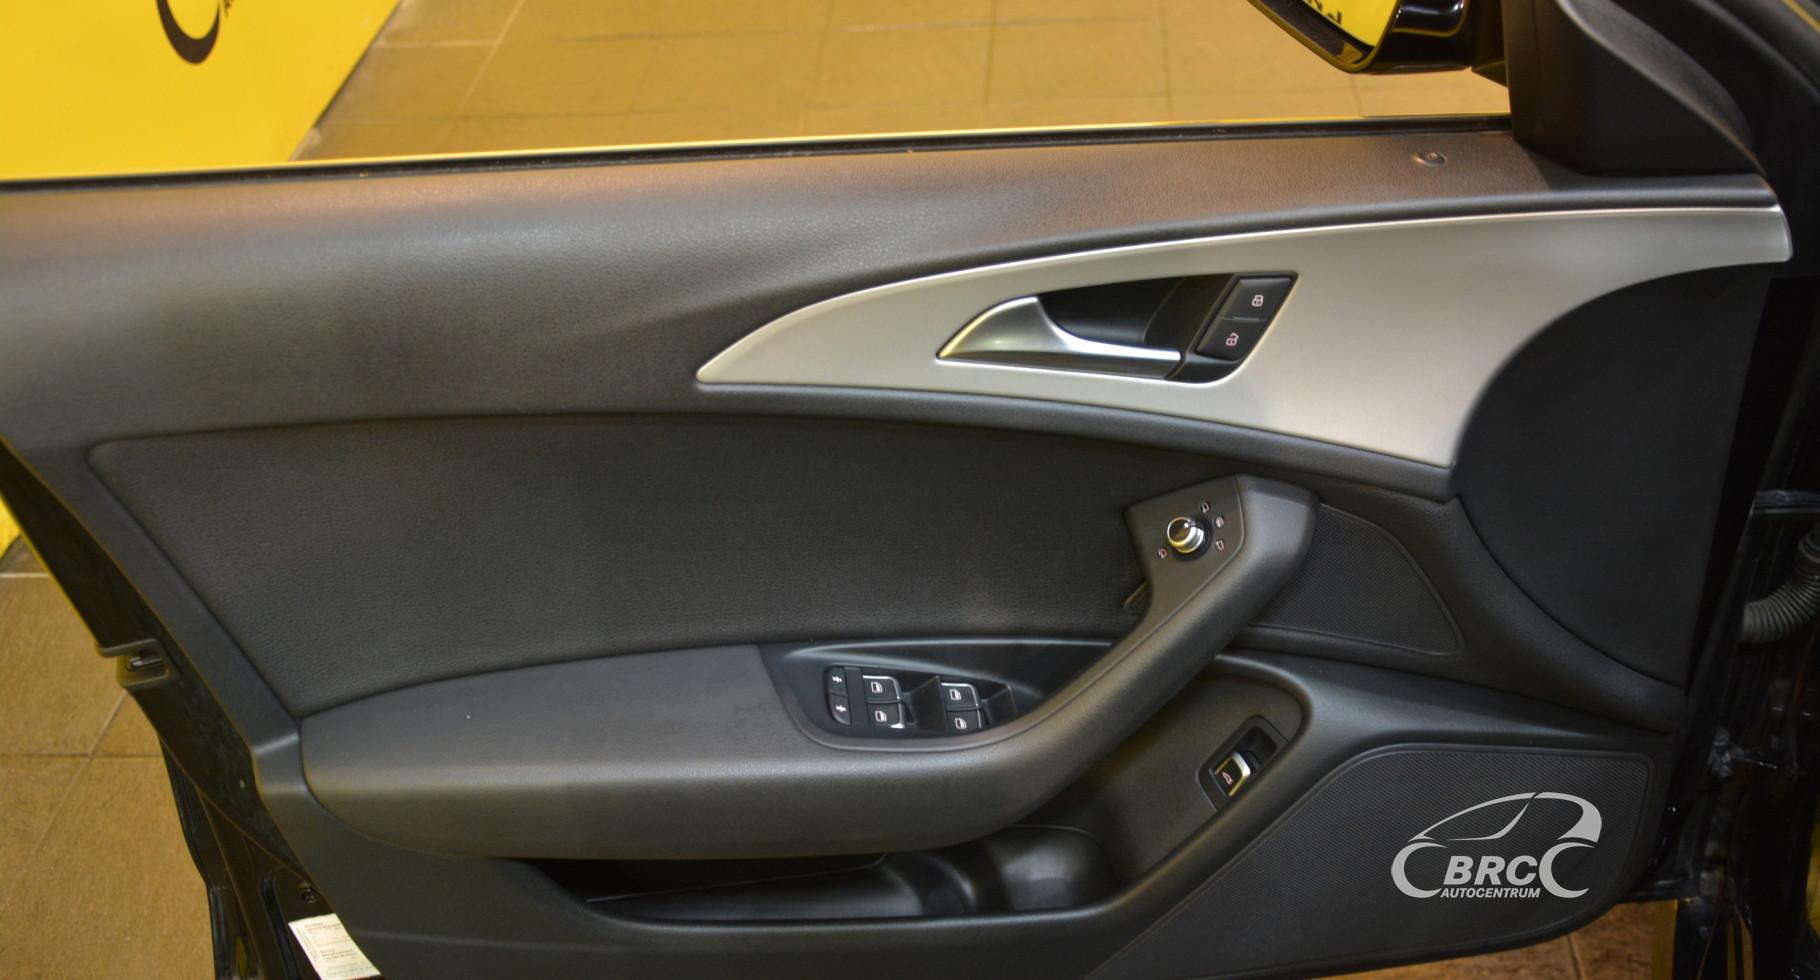 Audi A6 Avant 2.0TDI Automatas